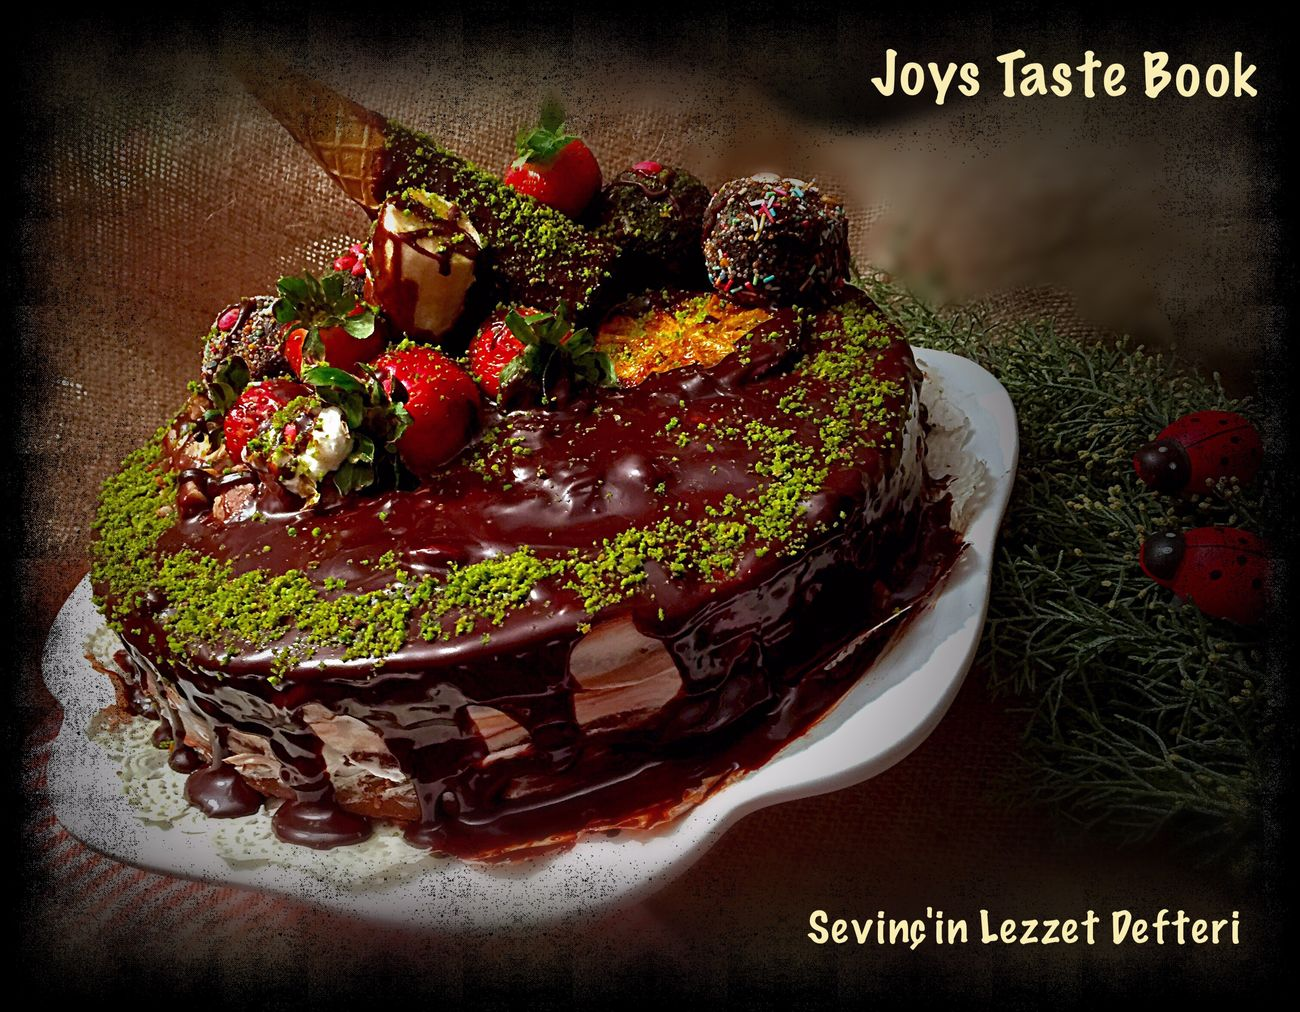 Efsane bi' lezzet 😋 özel yaptığım Doğumgünüpastası 🔝🎂 Cake Food Dessert Sweet Food Delicious Dessert Like4like çikolata Yummy Bakery Istanbul ❤️ Türkiye 🇹🇷 Foodphotography Foodblog Sevinç'in Lezzet Defteri JoysTasteBook Foodblogger SevinçYiğitArabacı JoyBraveDriver Strawberry 👍🏿 EyeEm Gallery EyeEm Best Shots Chocolate Lezzet Küpü